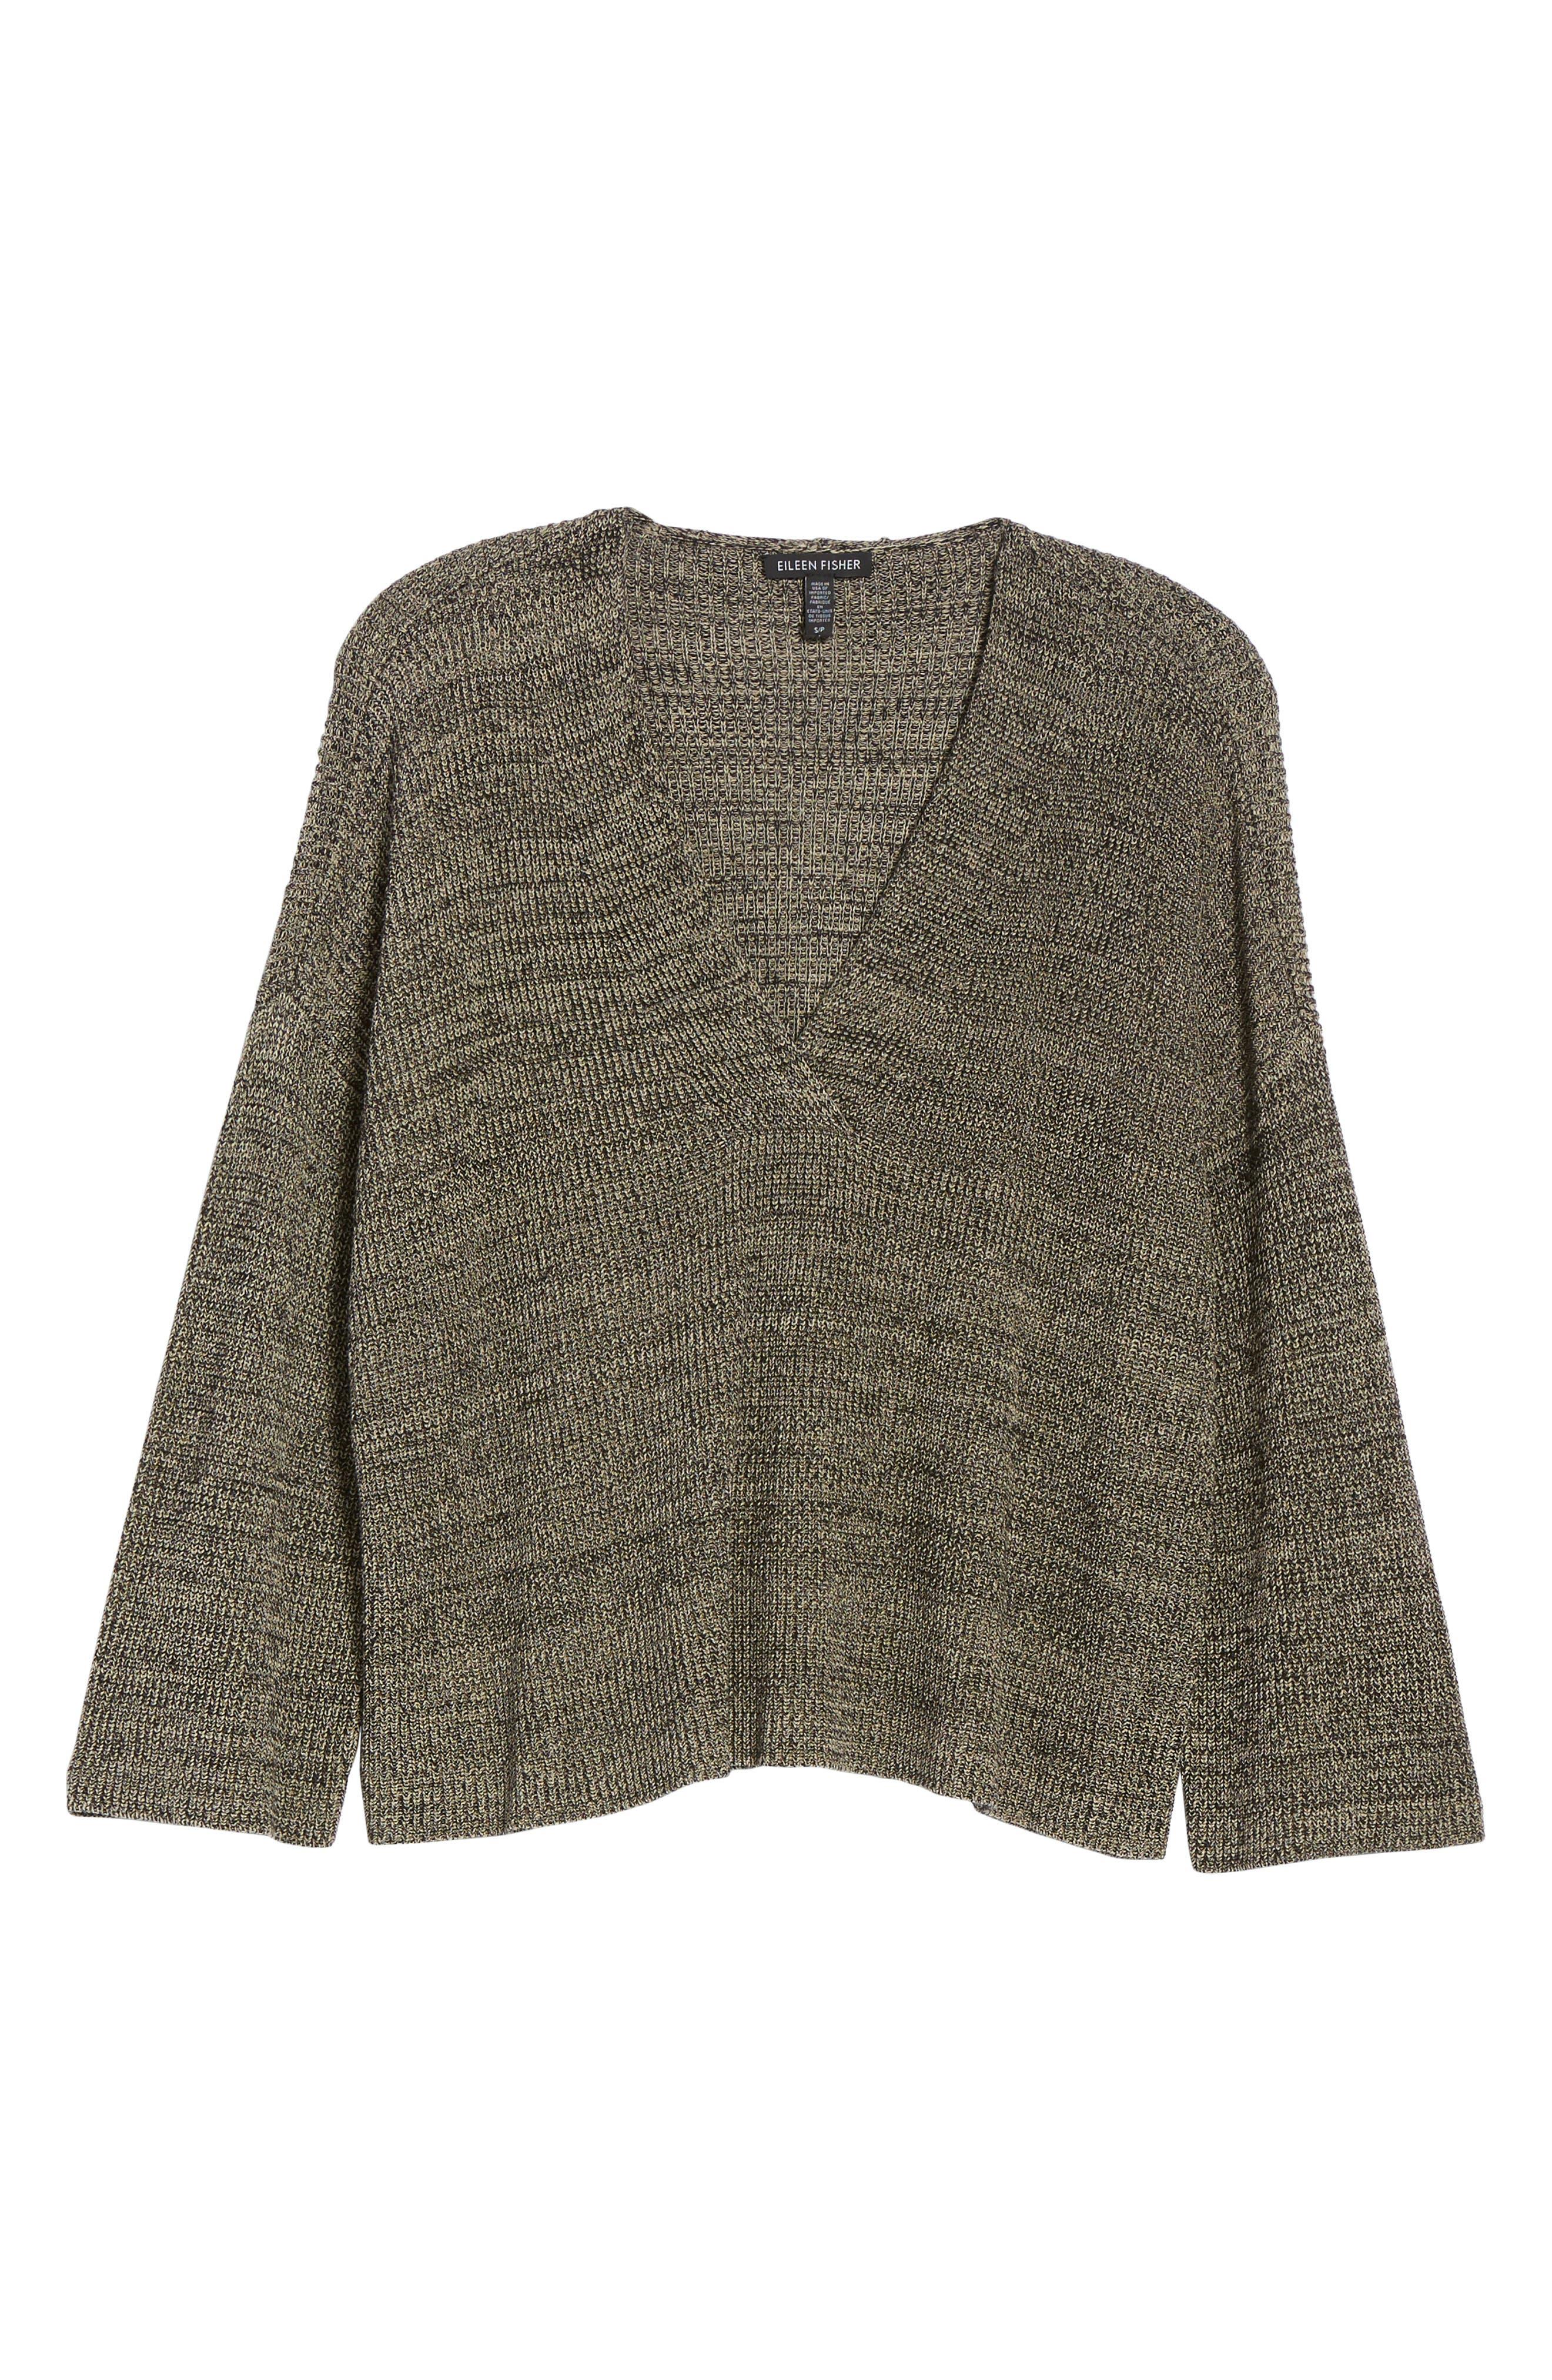 Mélange Knit Tencel<sup>®</sup> Crop Sweater,                             Alternate thumbnail 6, color,                             Black Natural